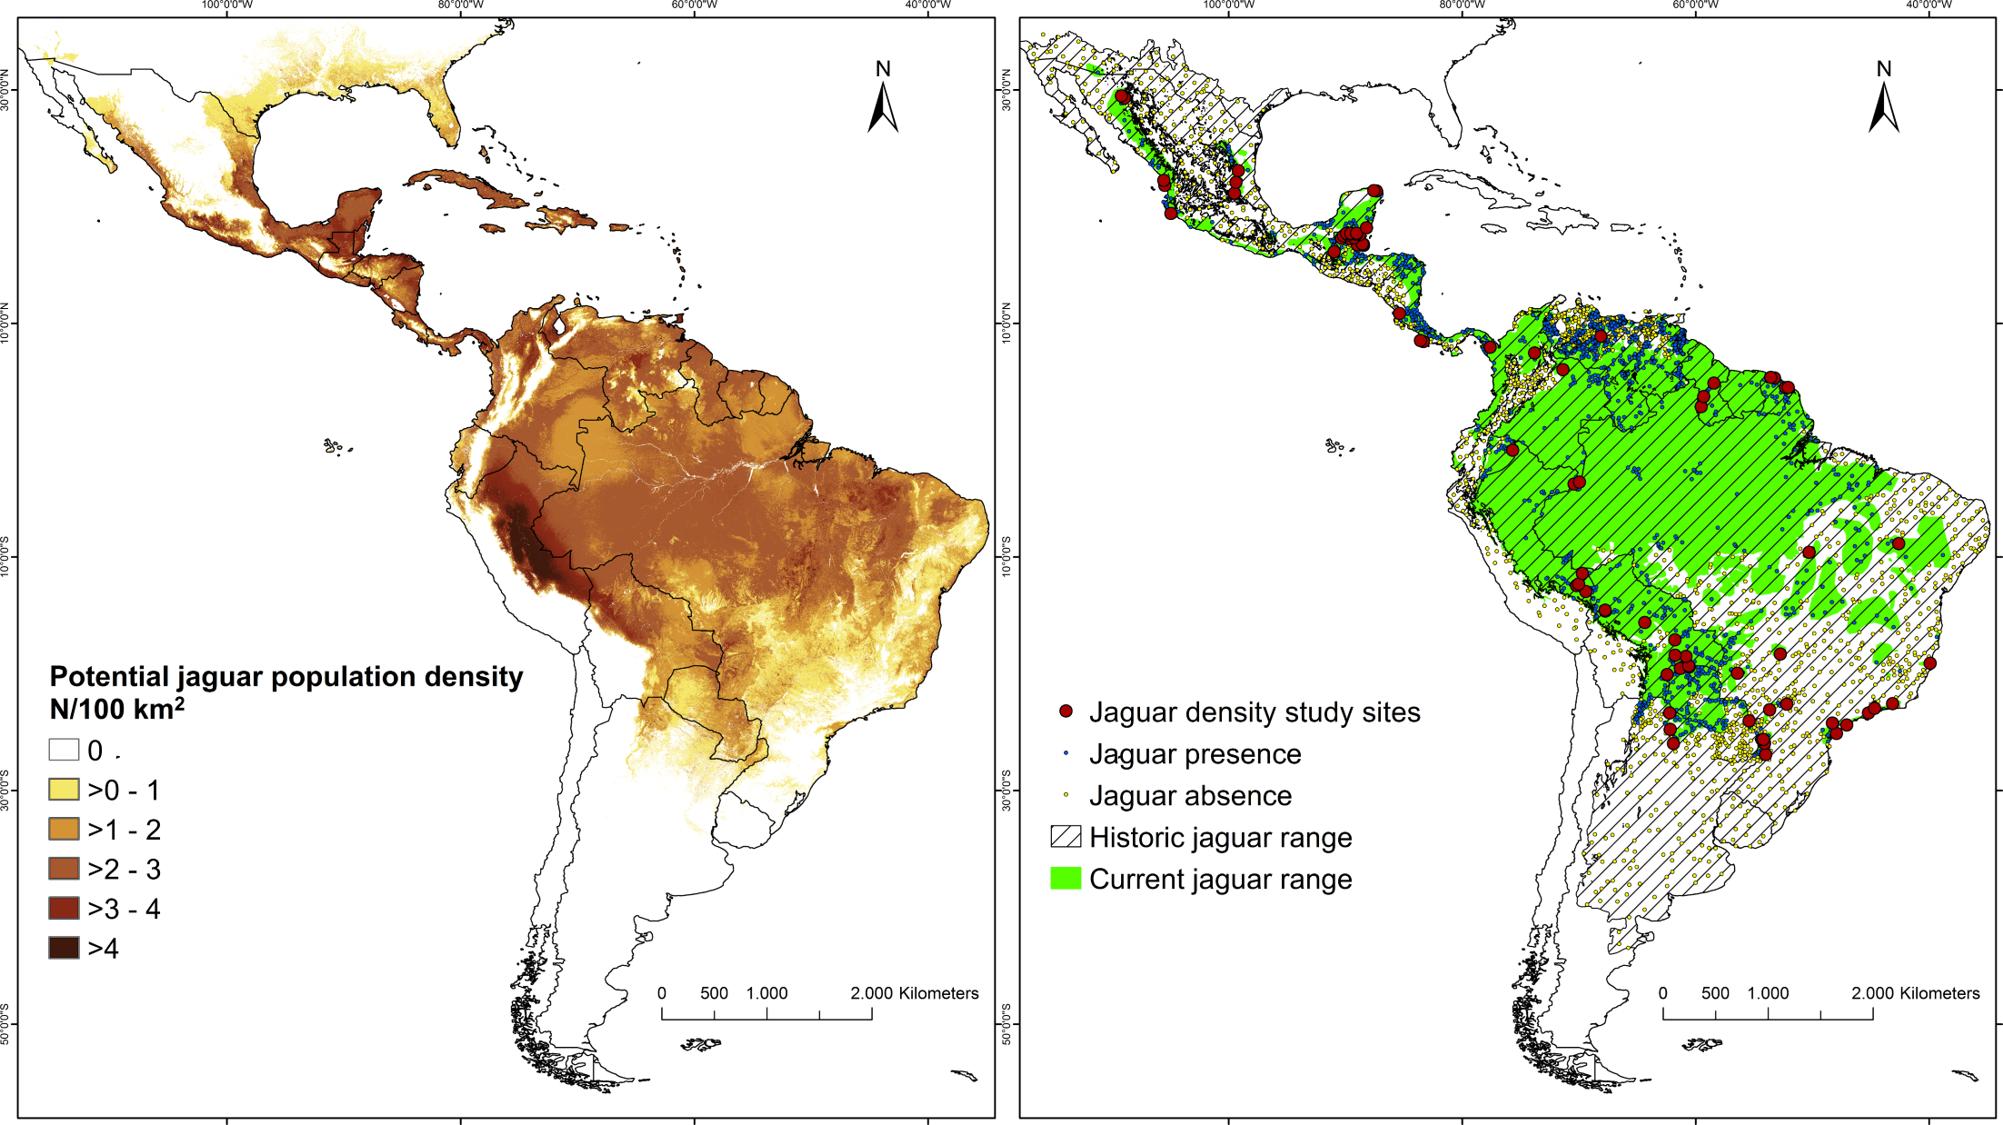 historic current range of jaguar